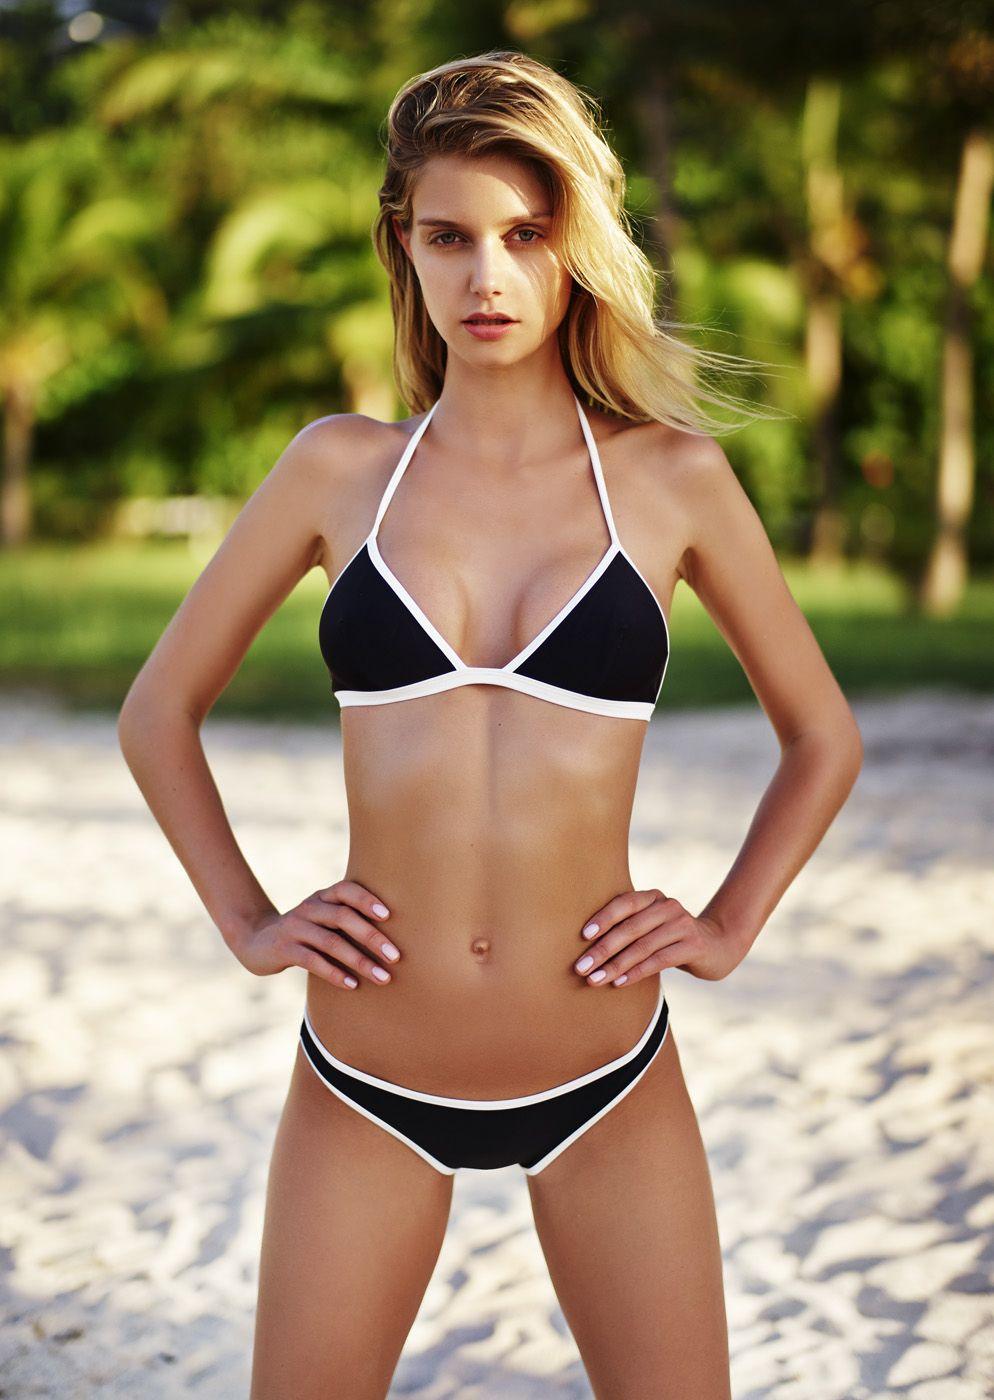 Photos Mathilde Frachon nudes (73 foto and video), Tits, Is a cute, Selfie, panties 2020